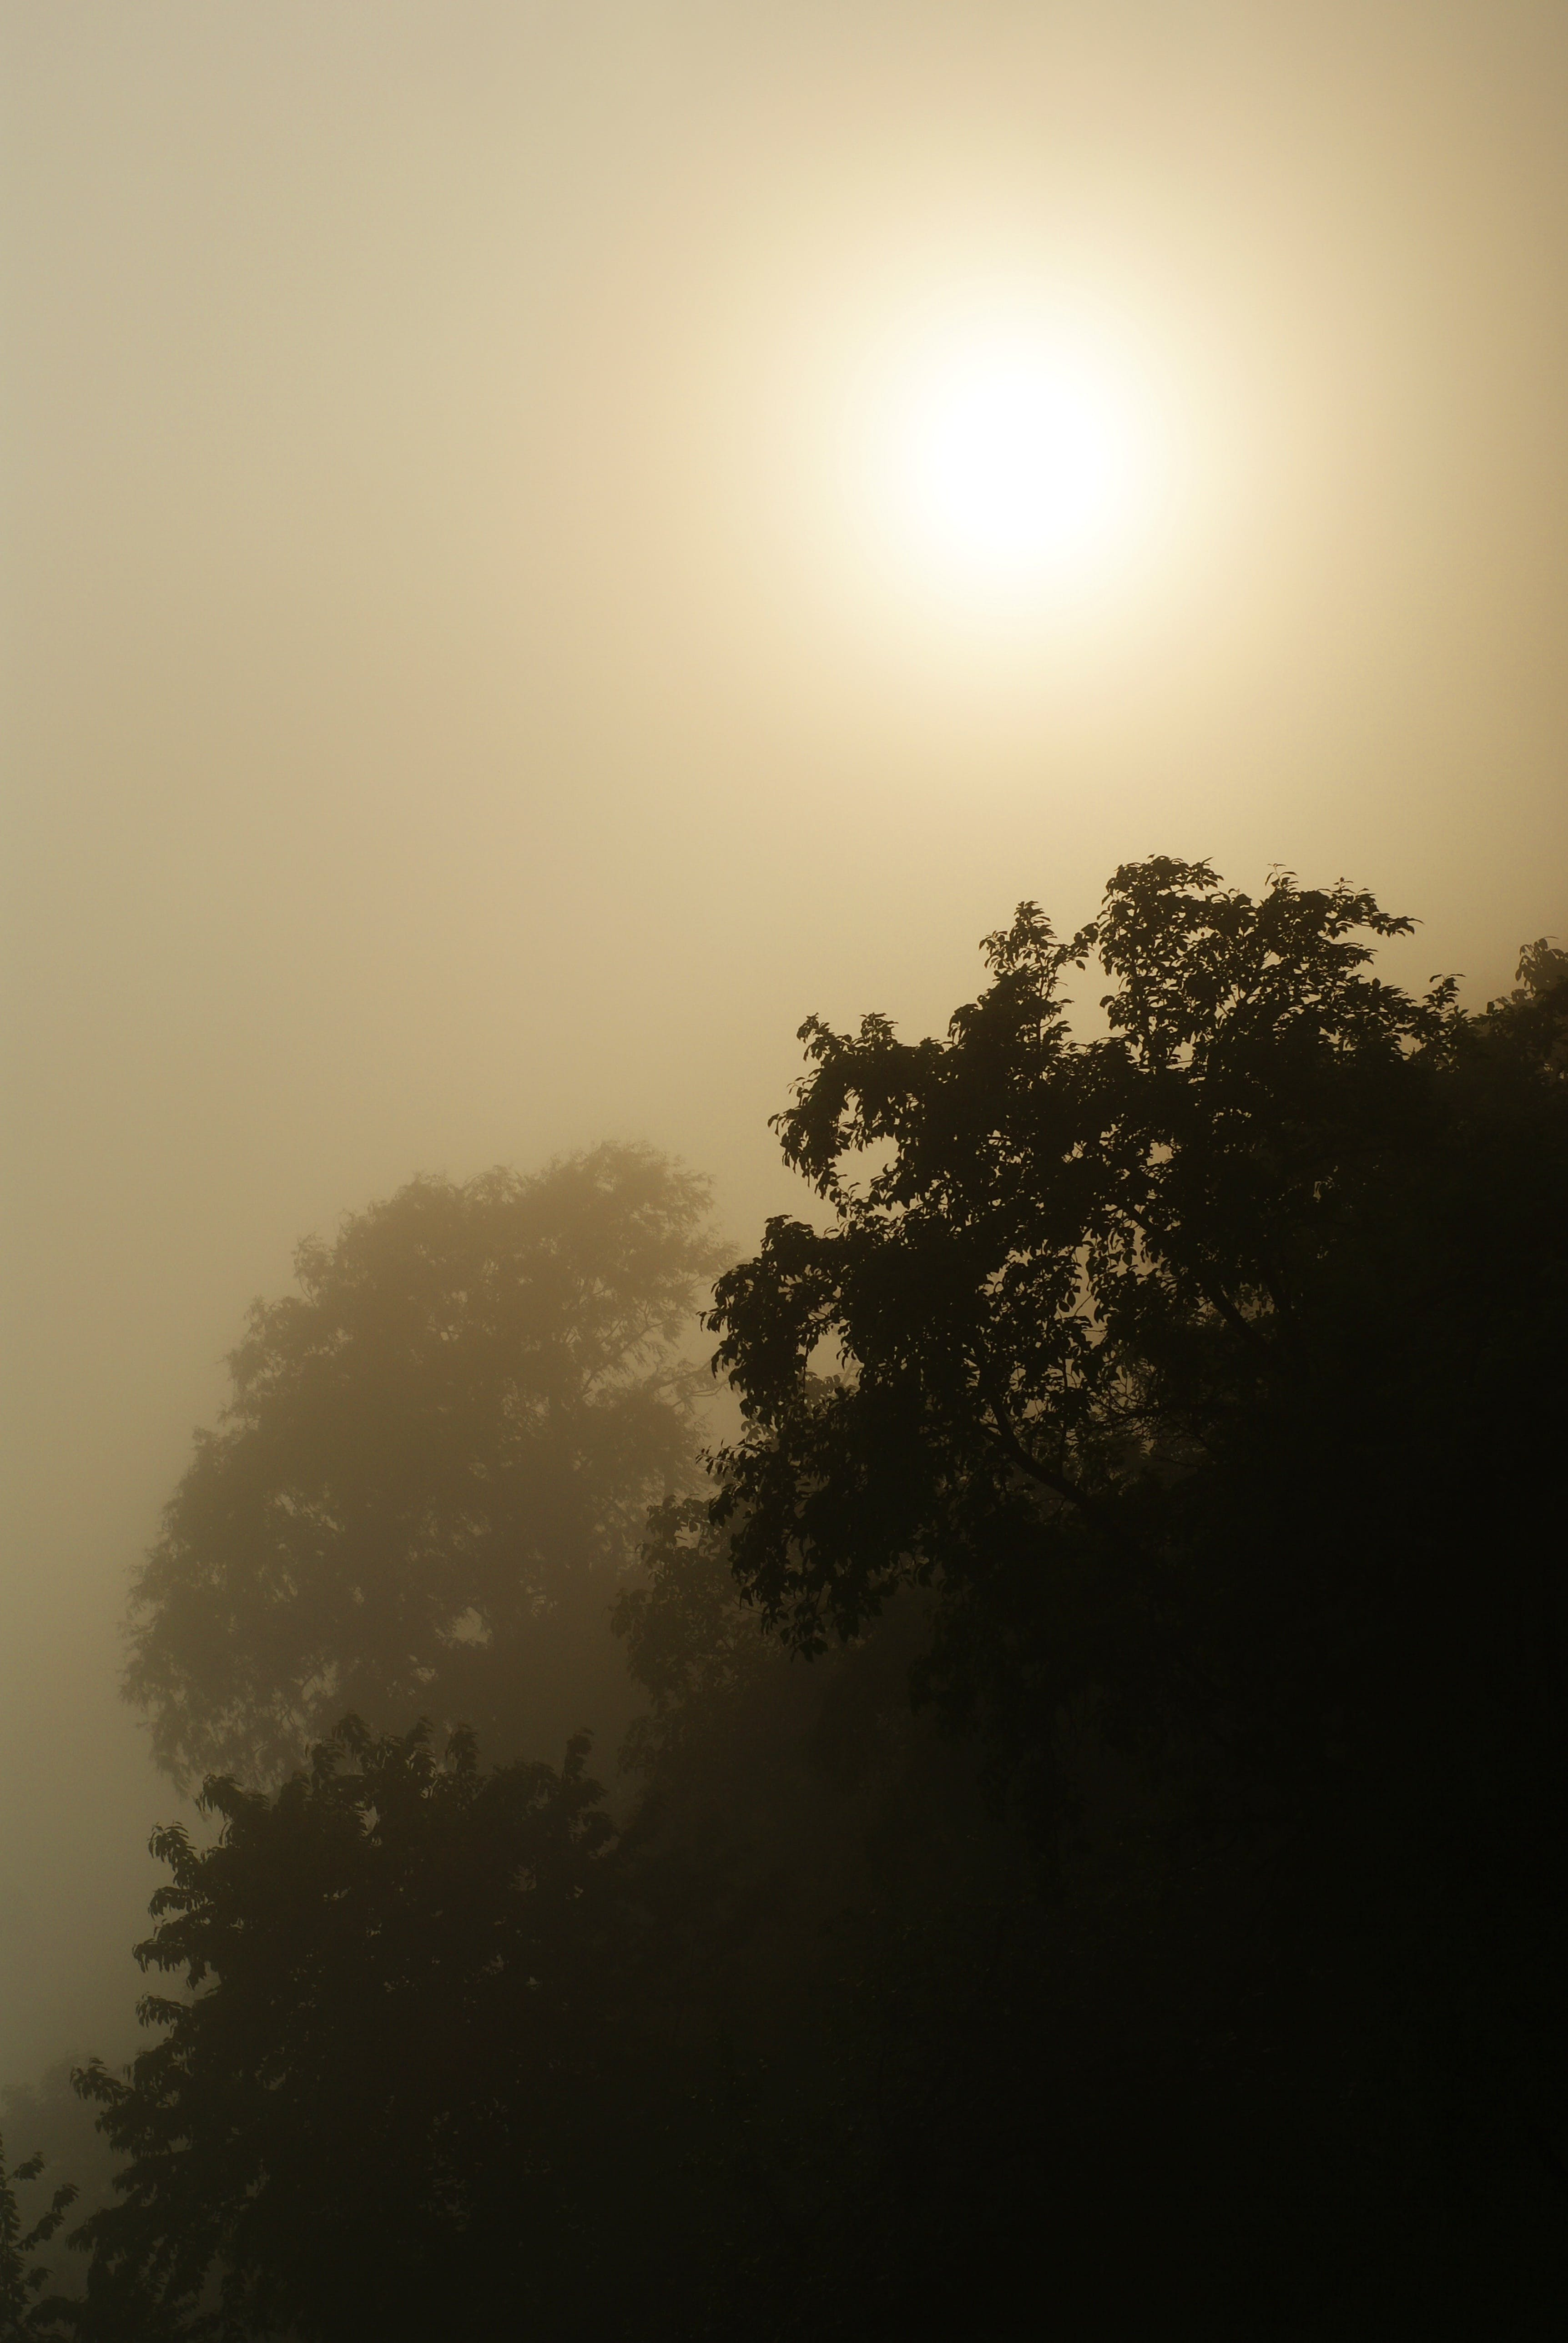 Free stock photo of sun, tree